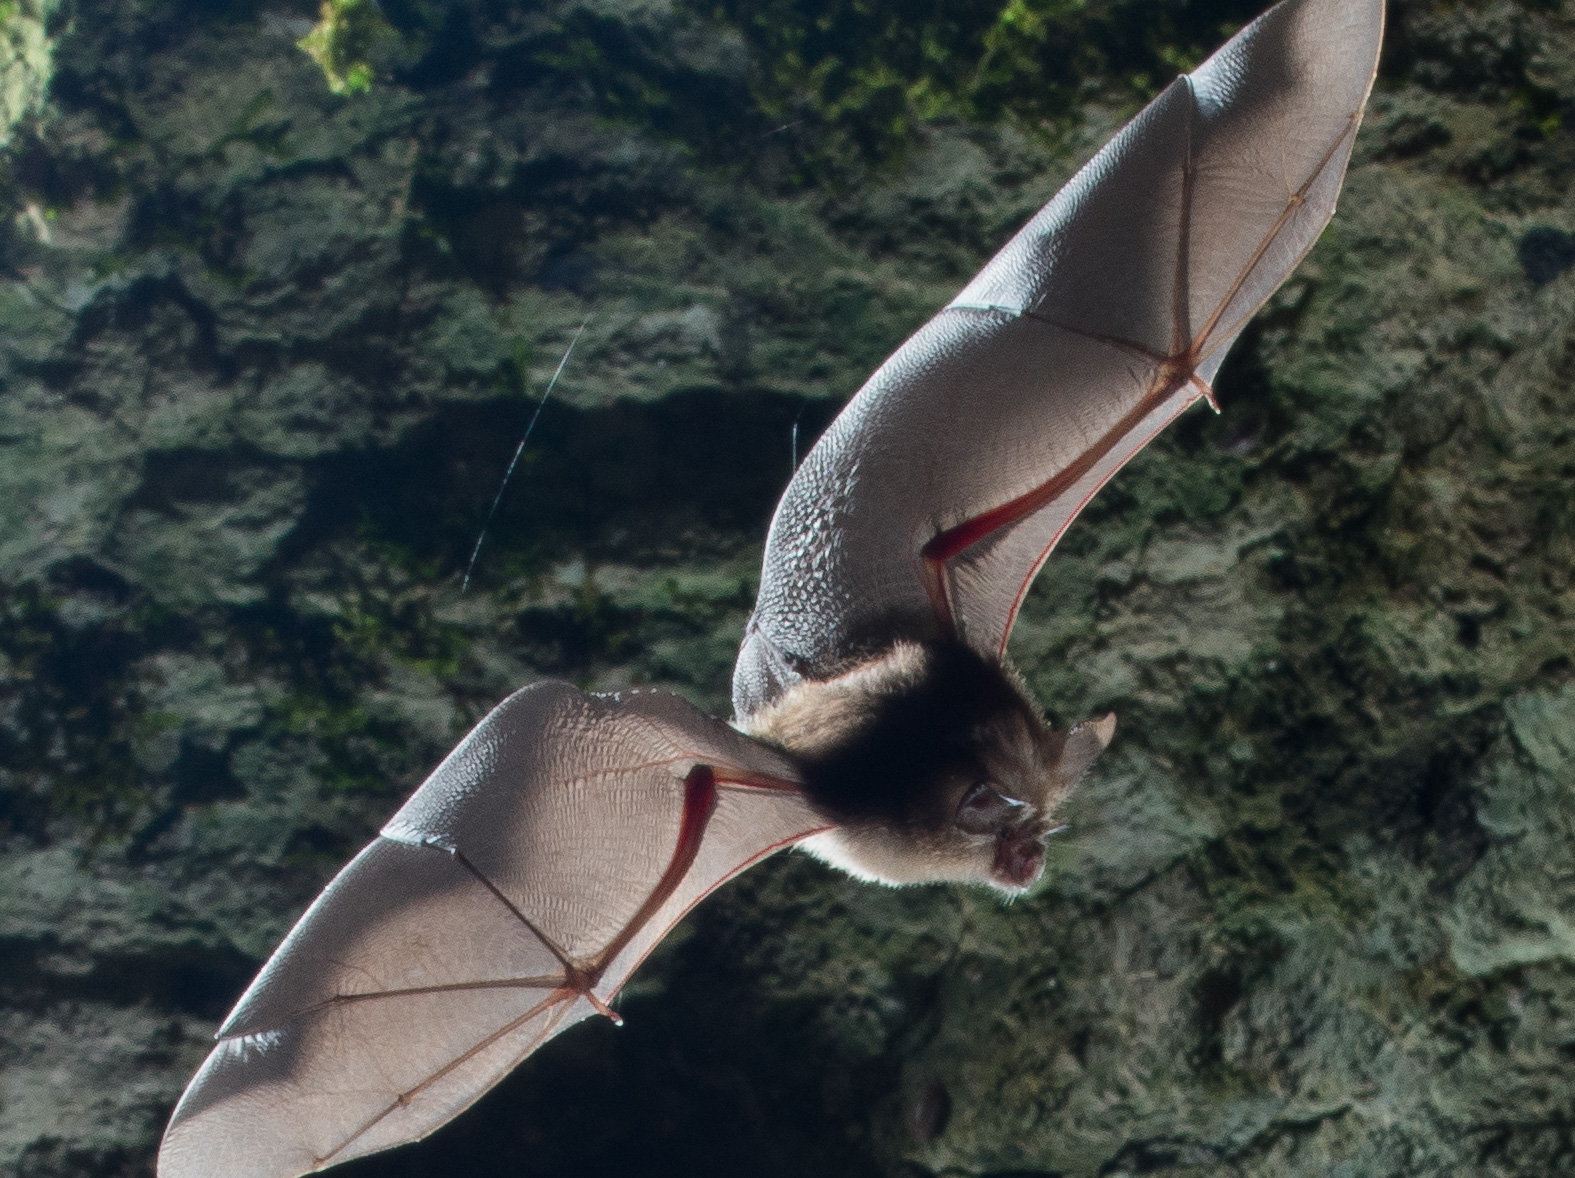 Bat at GB Gruffy3 - Lewis Hillier